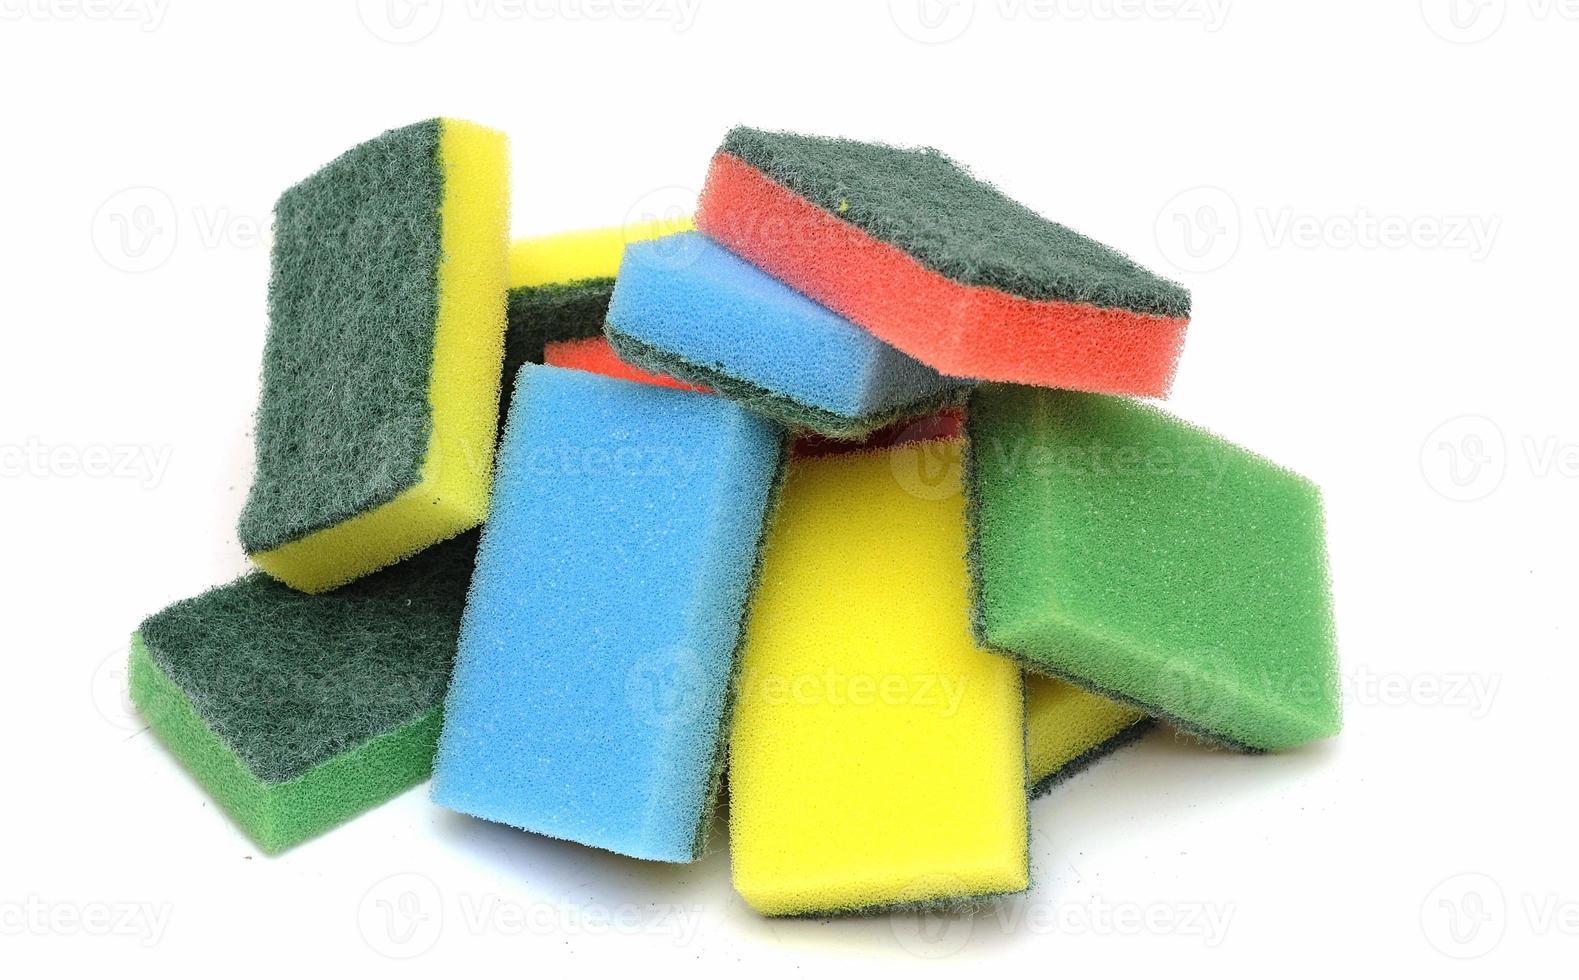 colorful sponge on the white background photo